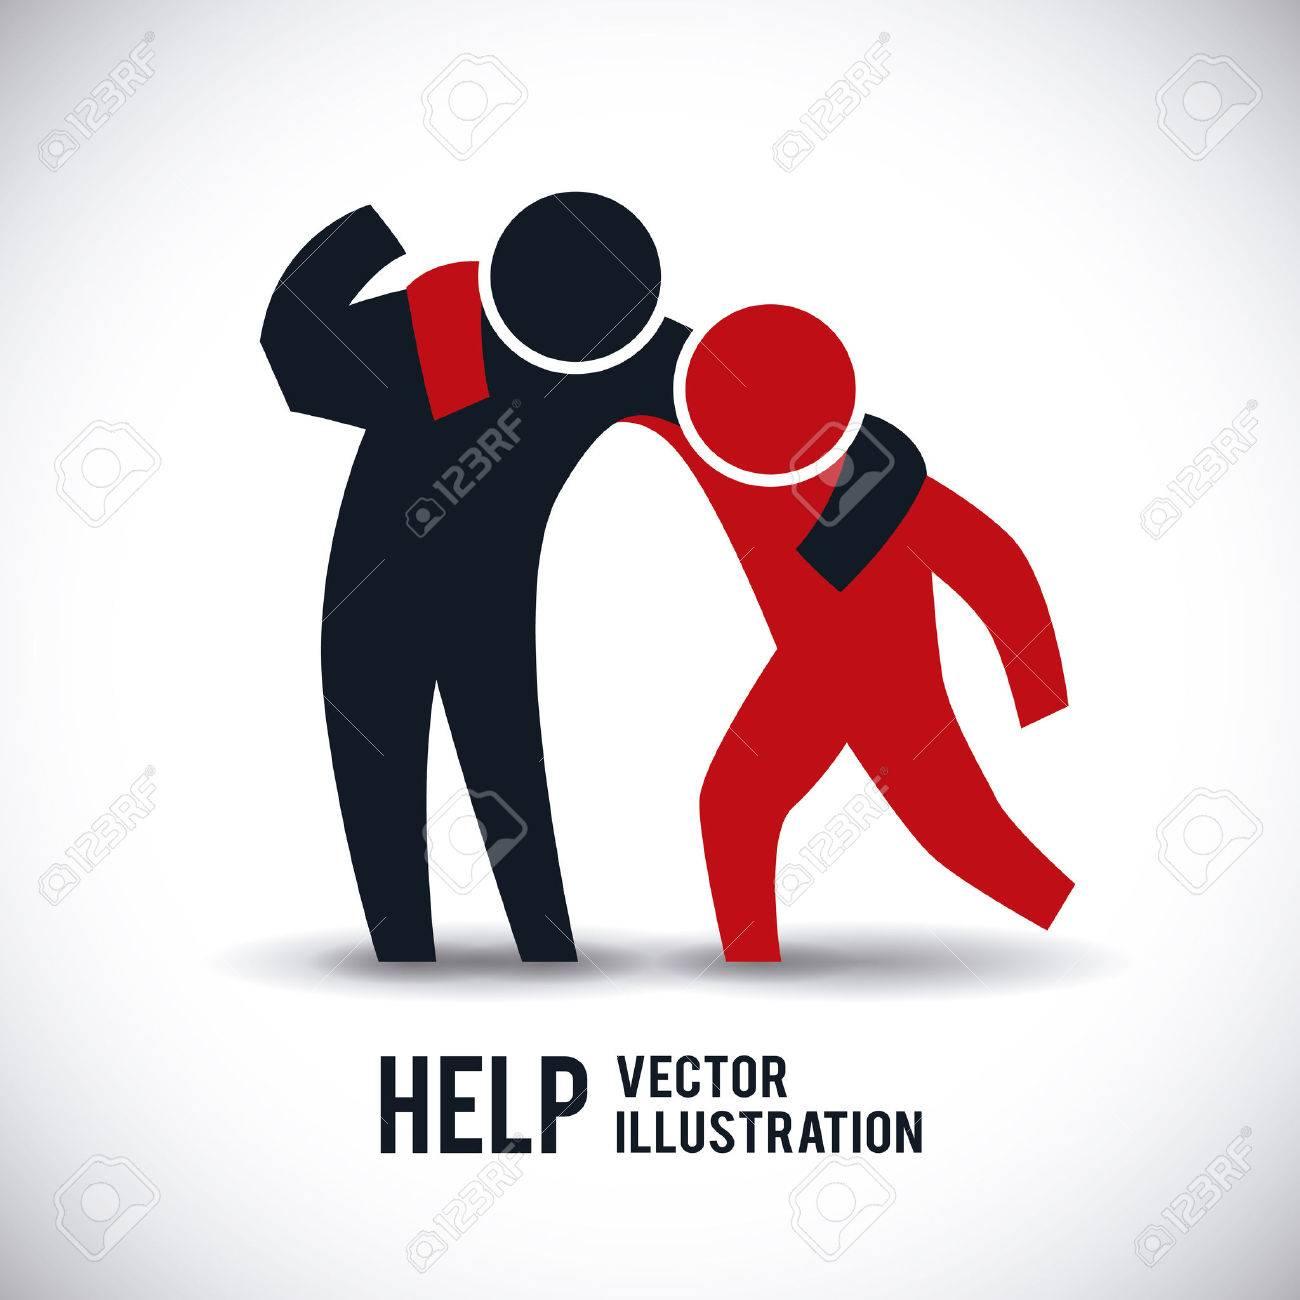 help graphic design illustration royalty free cliparts vectors rh 123rf com helping helpdesk